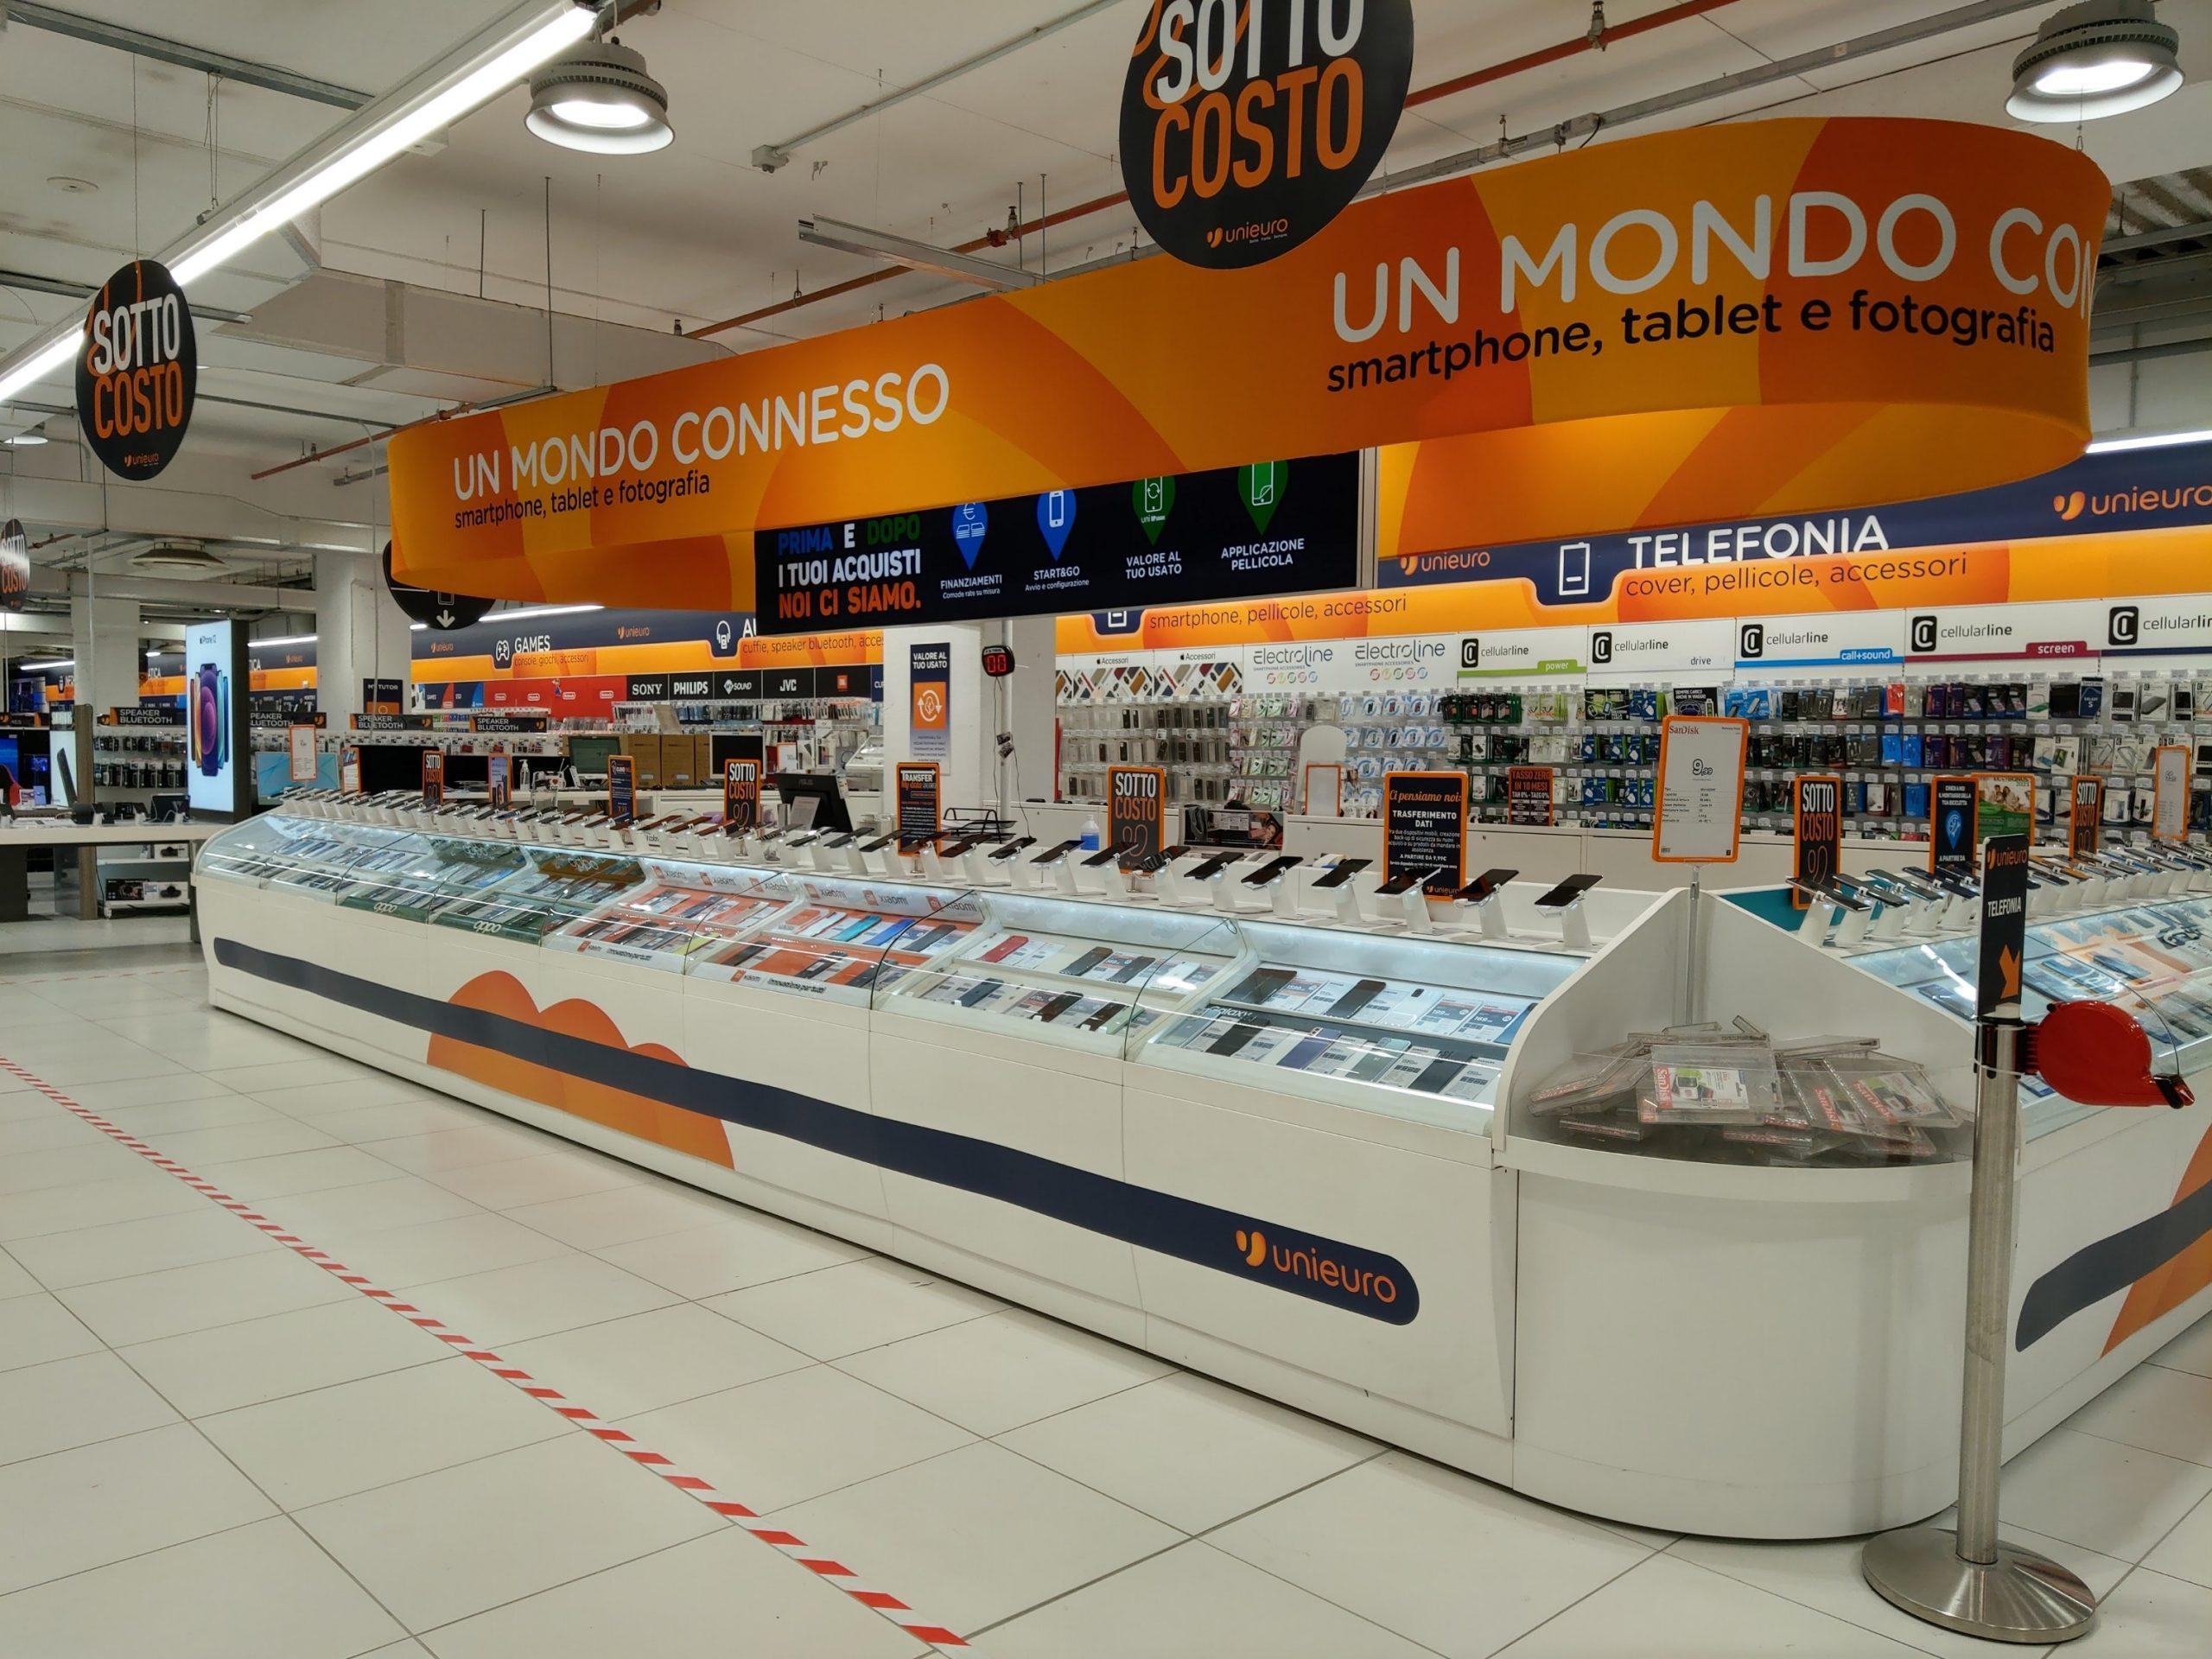 Unieuro reinaugura 12 negozi in tutta Italia